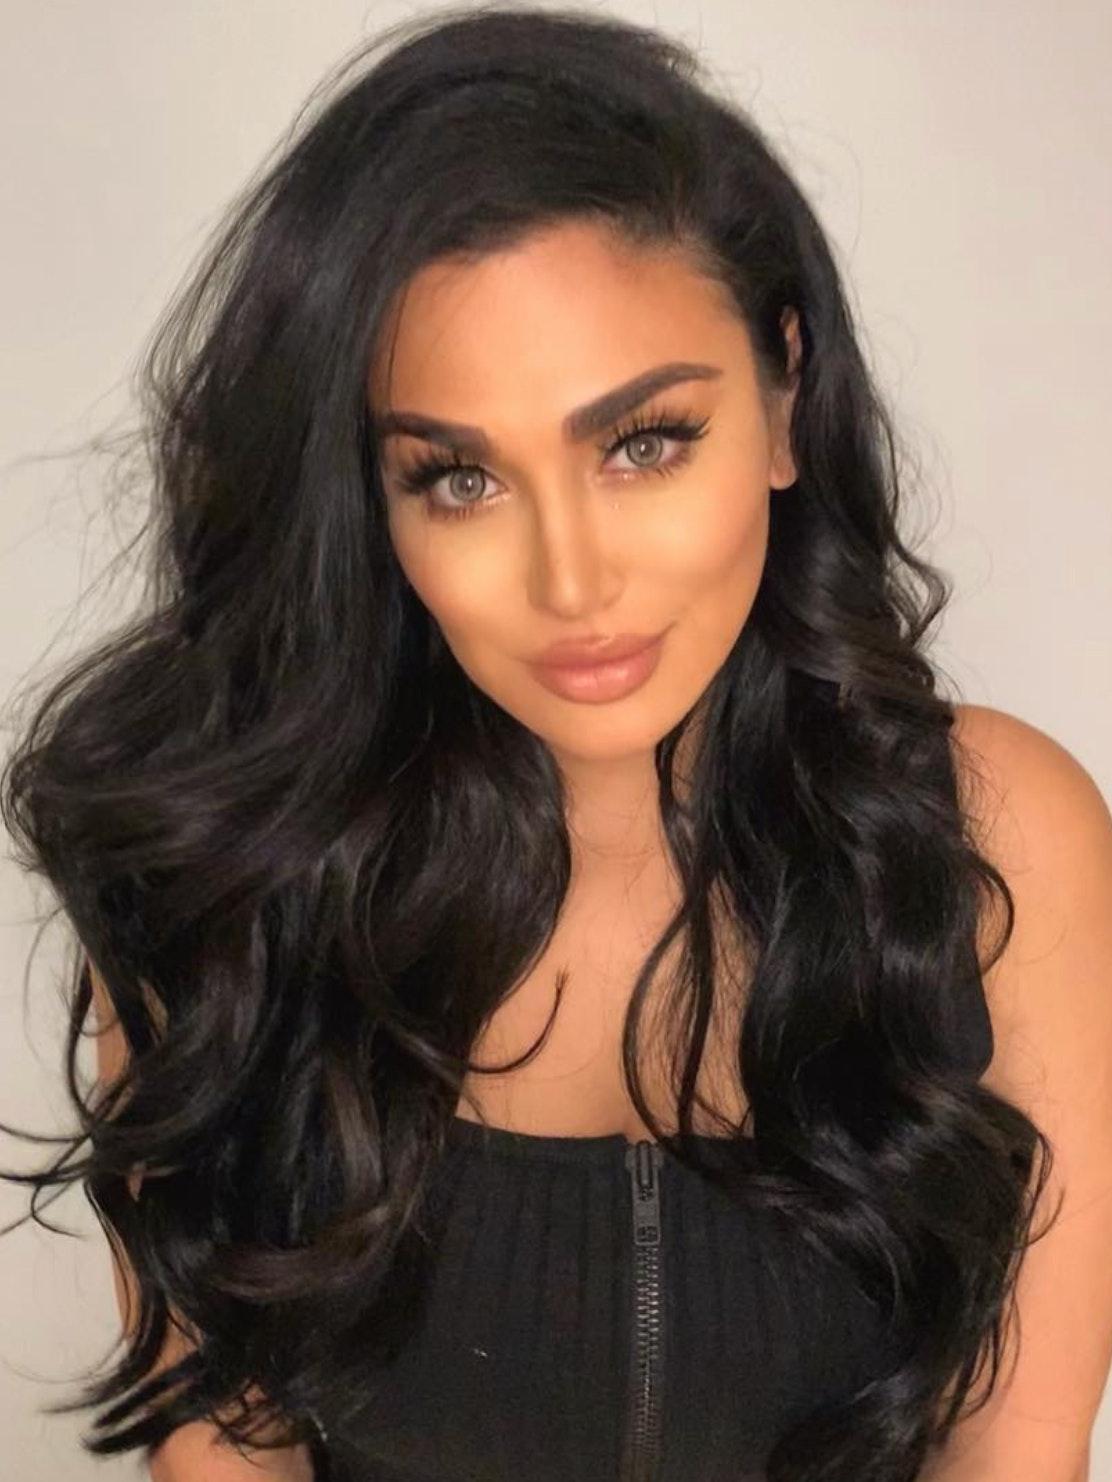 Huda Kattan, makeup mogul, entrepreneur, and content creator